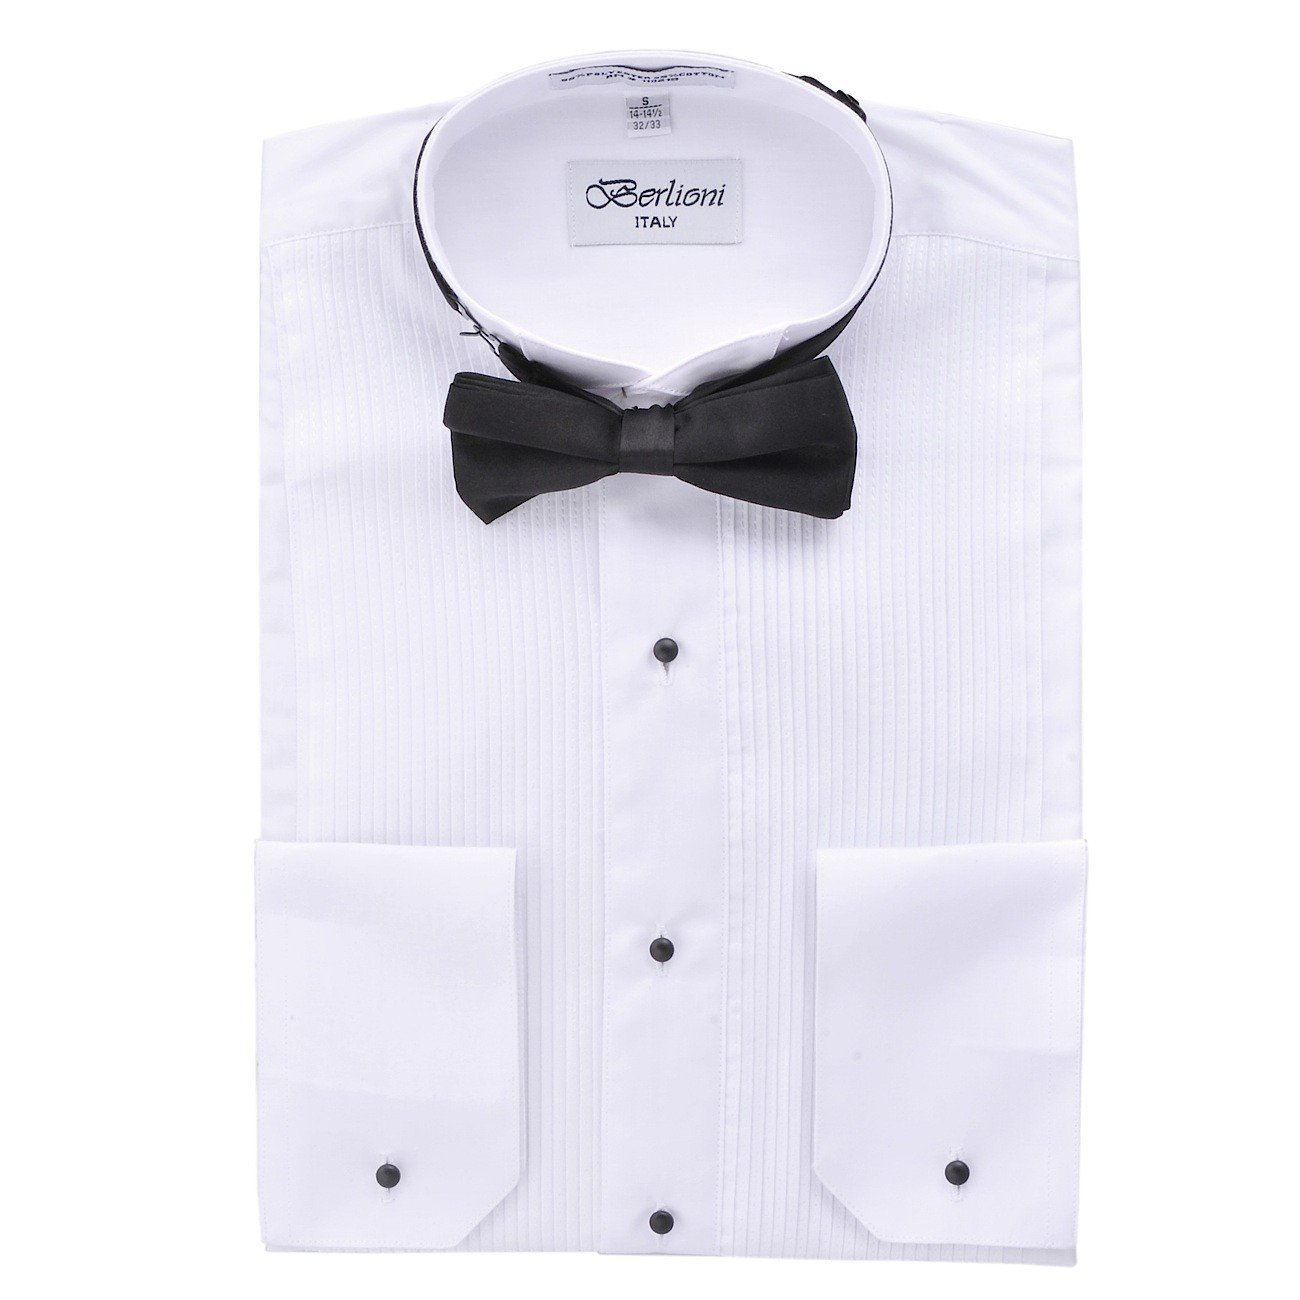 Elegant Men's Cufflink Convertible White Tuxedo Dress Shirt + Black Bowtie (Medium – 15/15.5 Neck; 32/33 Sleeves)